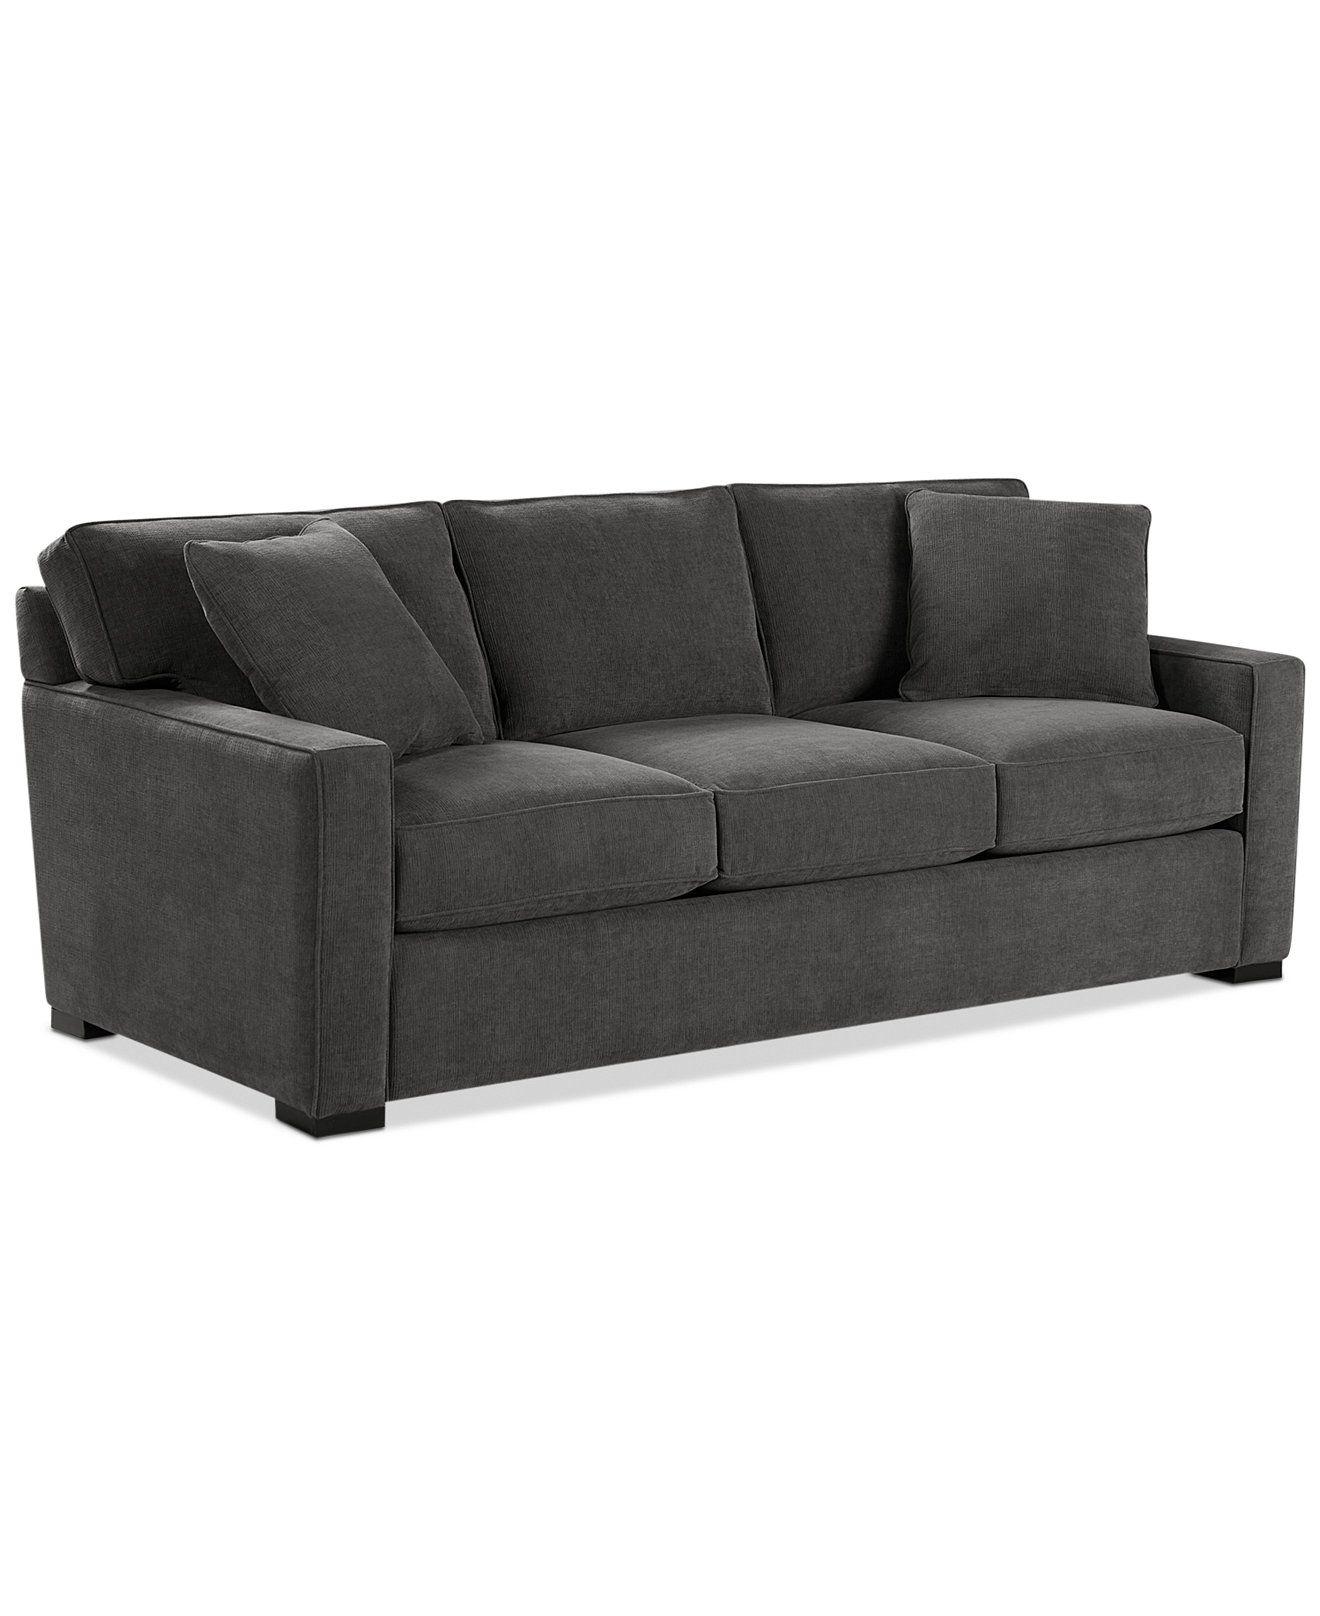 Radley 86 Fabric Queen Sleeper Sofa Bed Created For Macy S Sofa